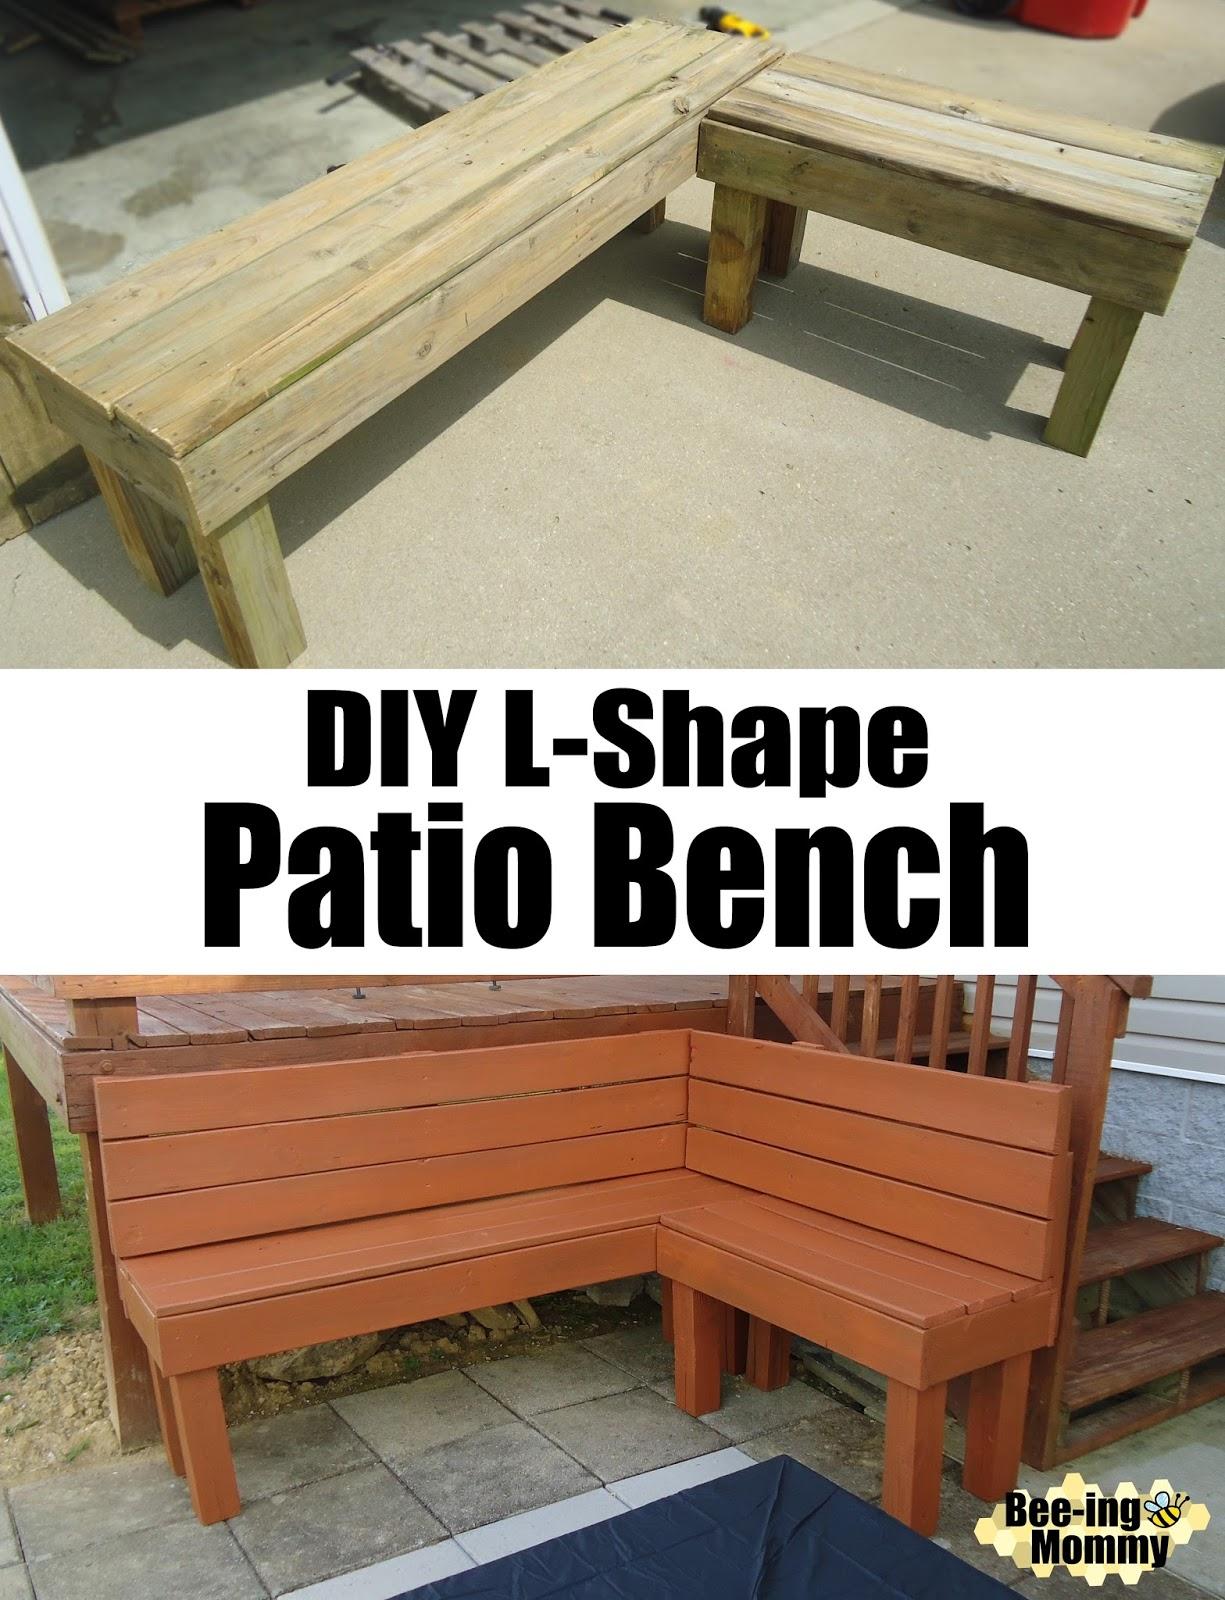 diy l shape patio